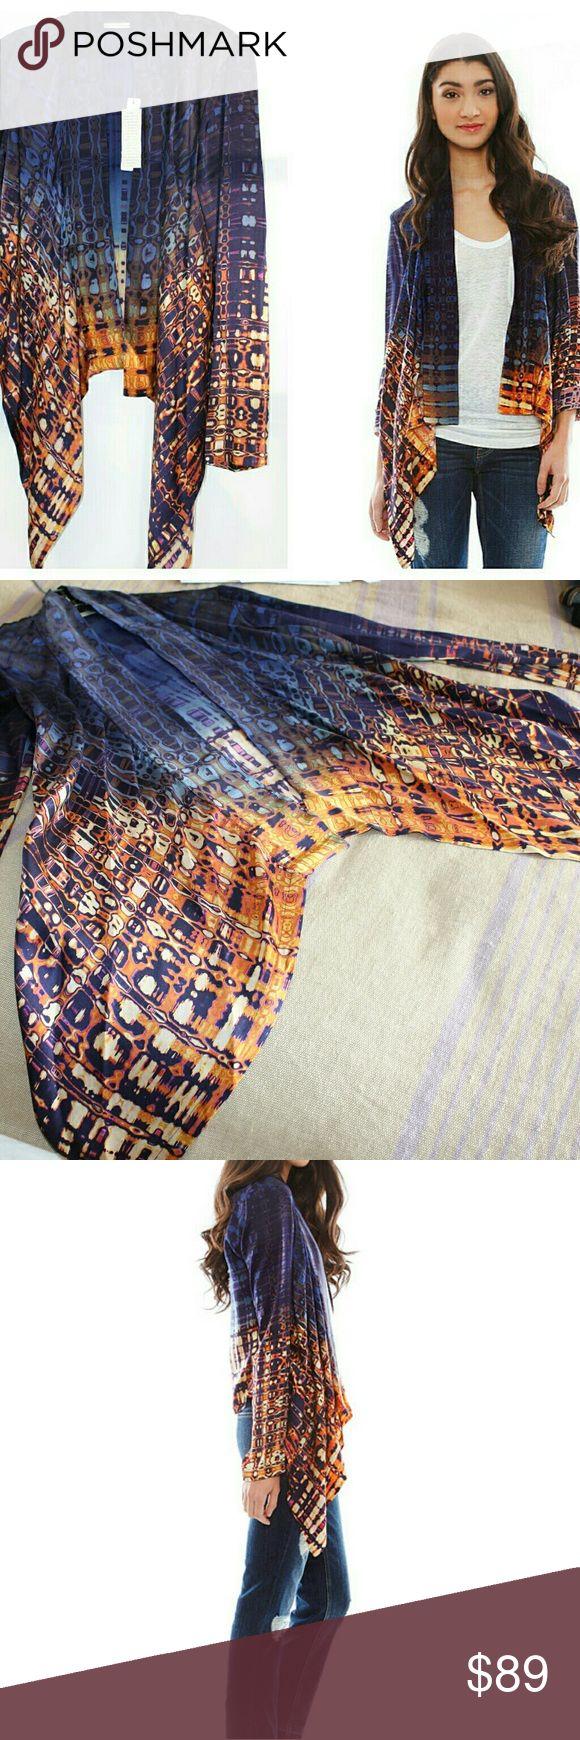 "100% silk ""Dip dye"" jacket kimono beautiful item!! Open front, long sleeve, silk jacket - tie dye look Twelfth Street by Cynthia Vincent Jackets & Coats Capes"